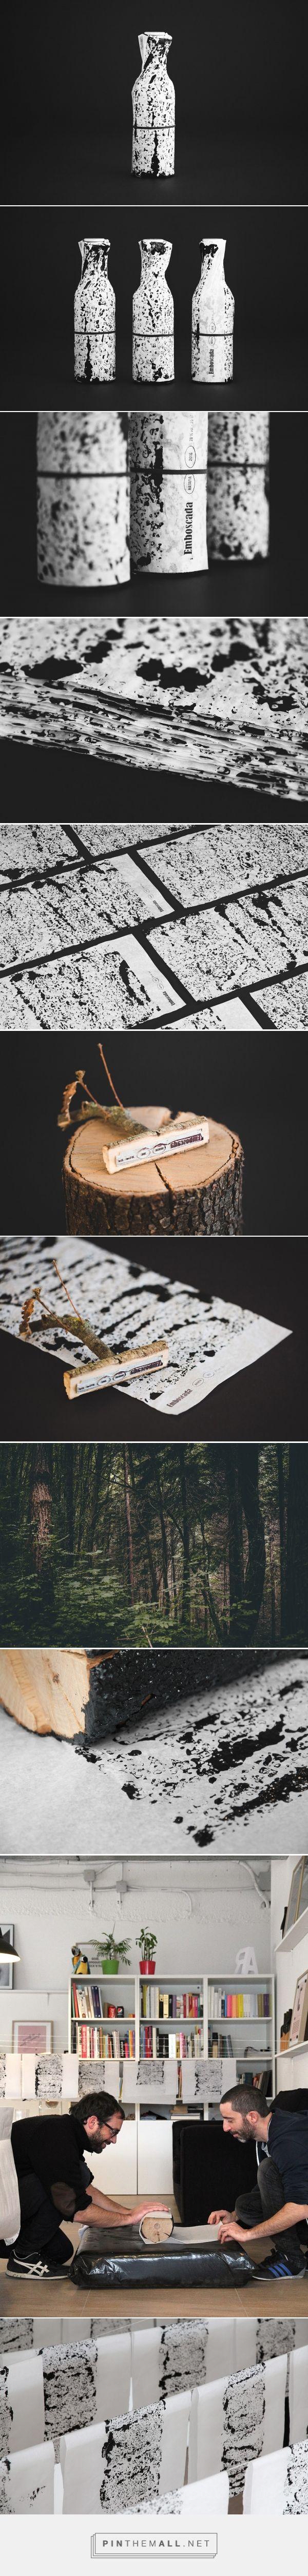 Emboscada packaging design by Enserio - https://www.packagingoftheworld.com/2018/04/emboscada.html